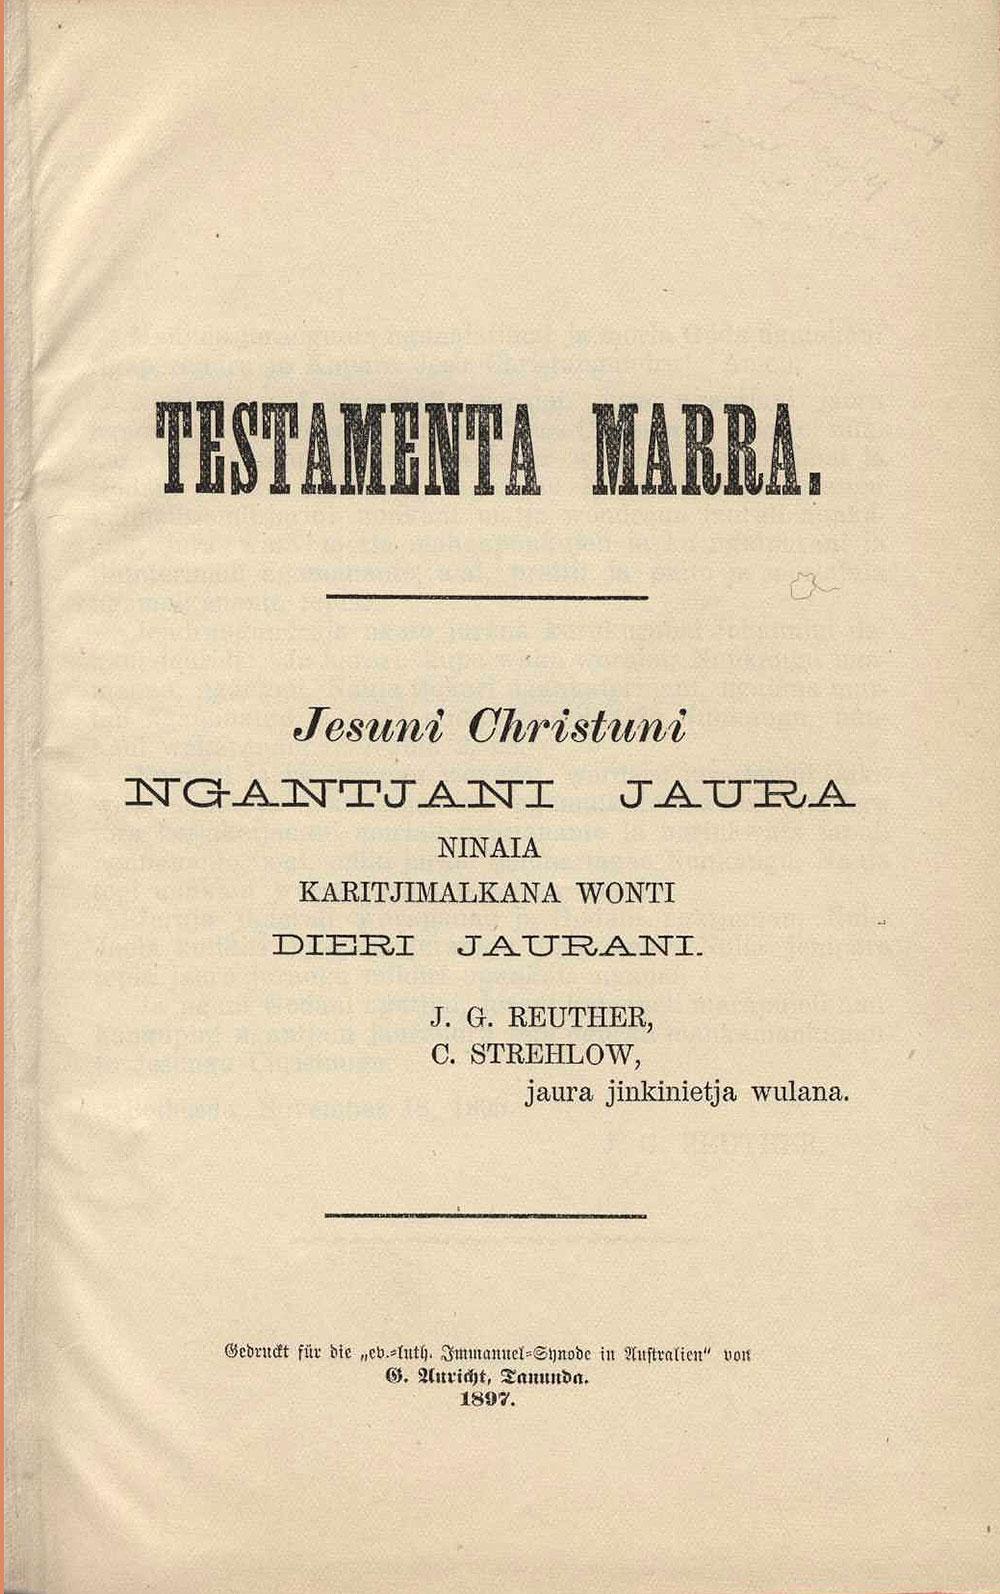 [Bible in Dieri]. <em>Testamenta Marra: Jesuni Christuni ngantjani jaura ninaia karitjimalkana wonti Dieri jaurani.</em> Tanunda [Australia]: G. Auricht, 1897.